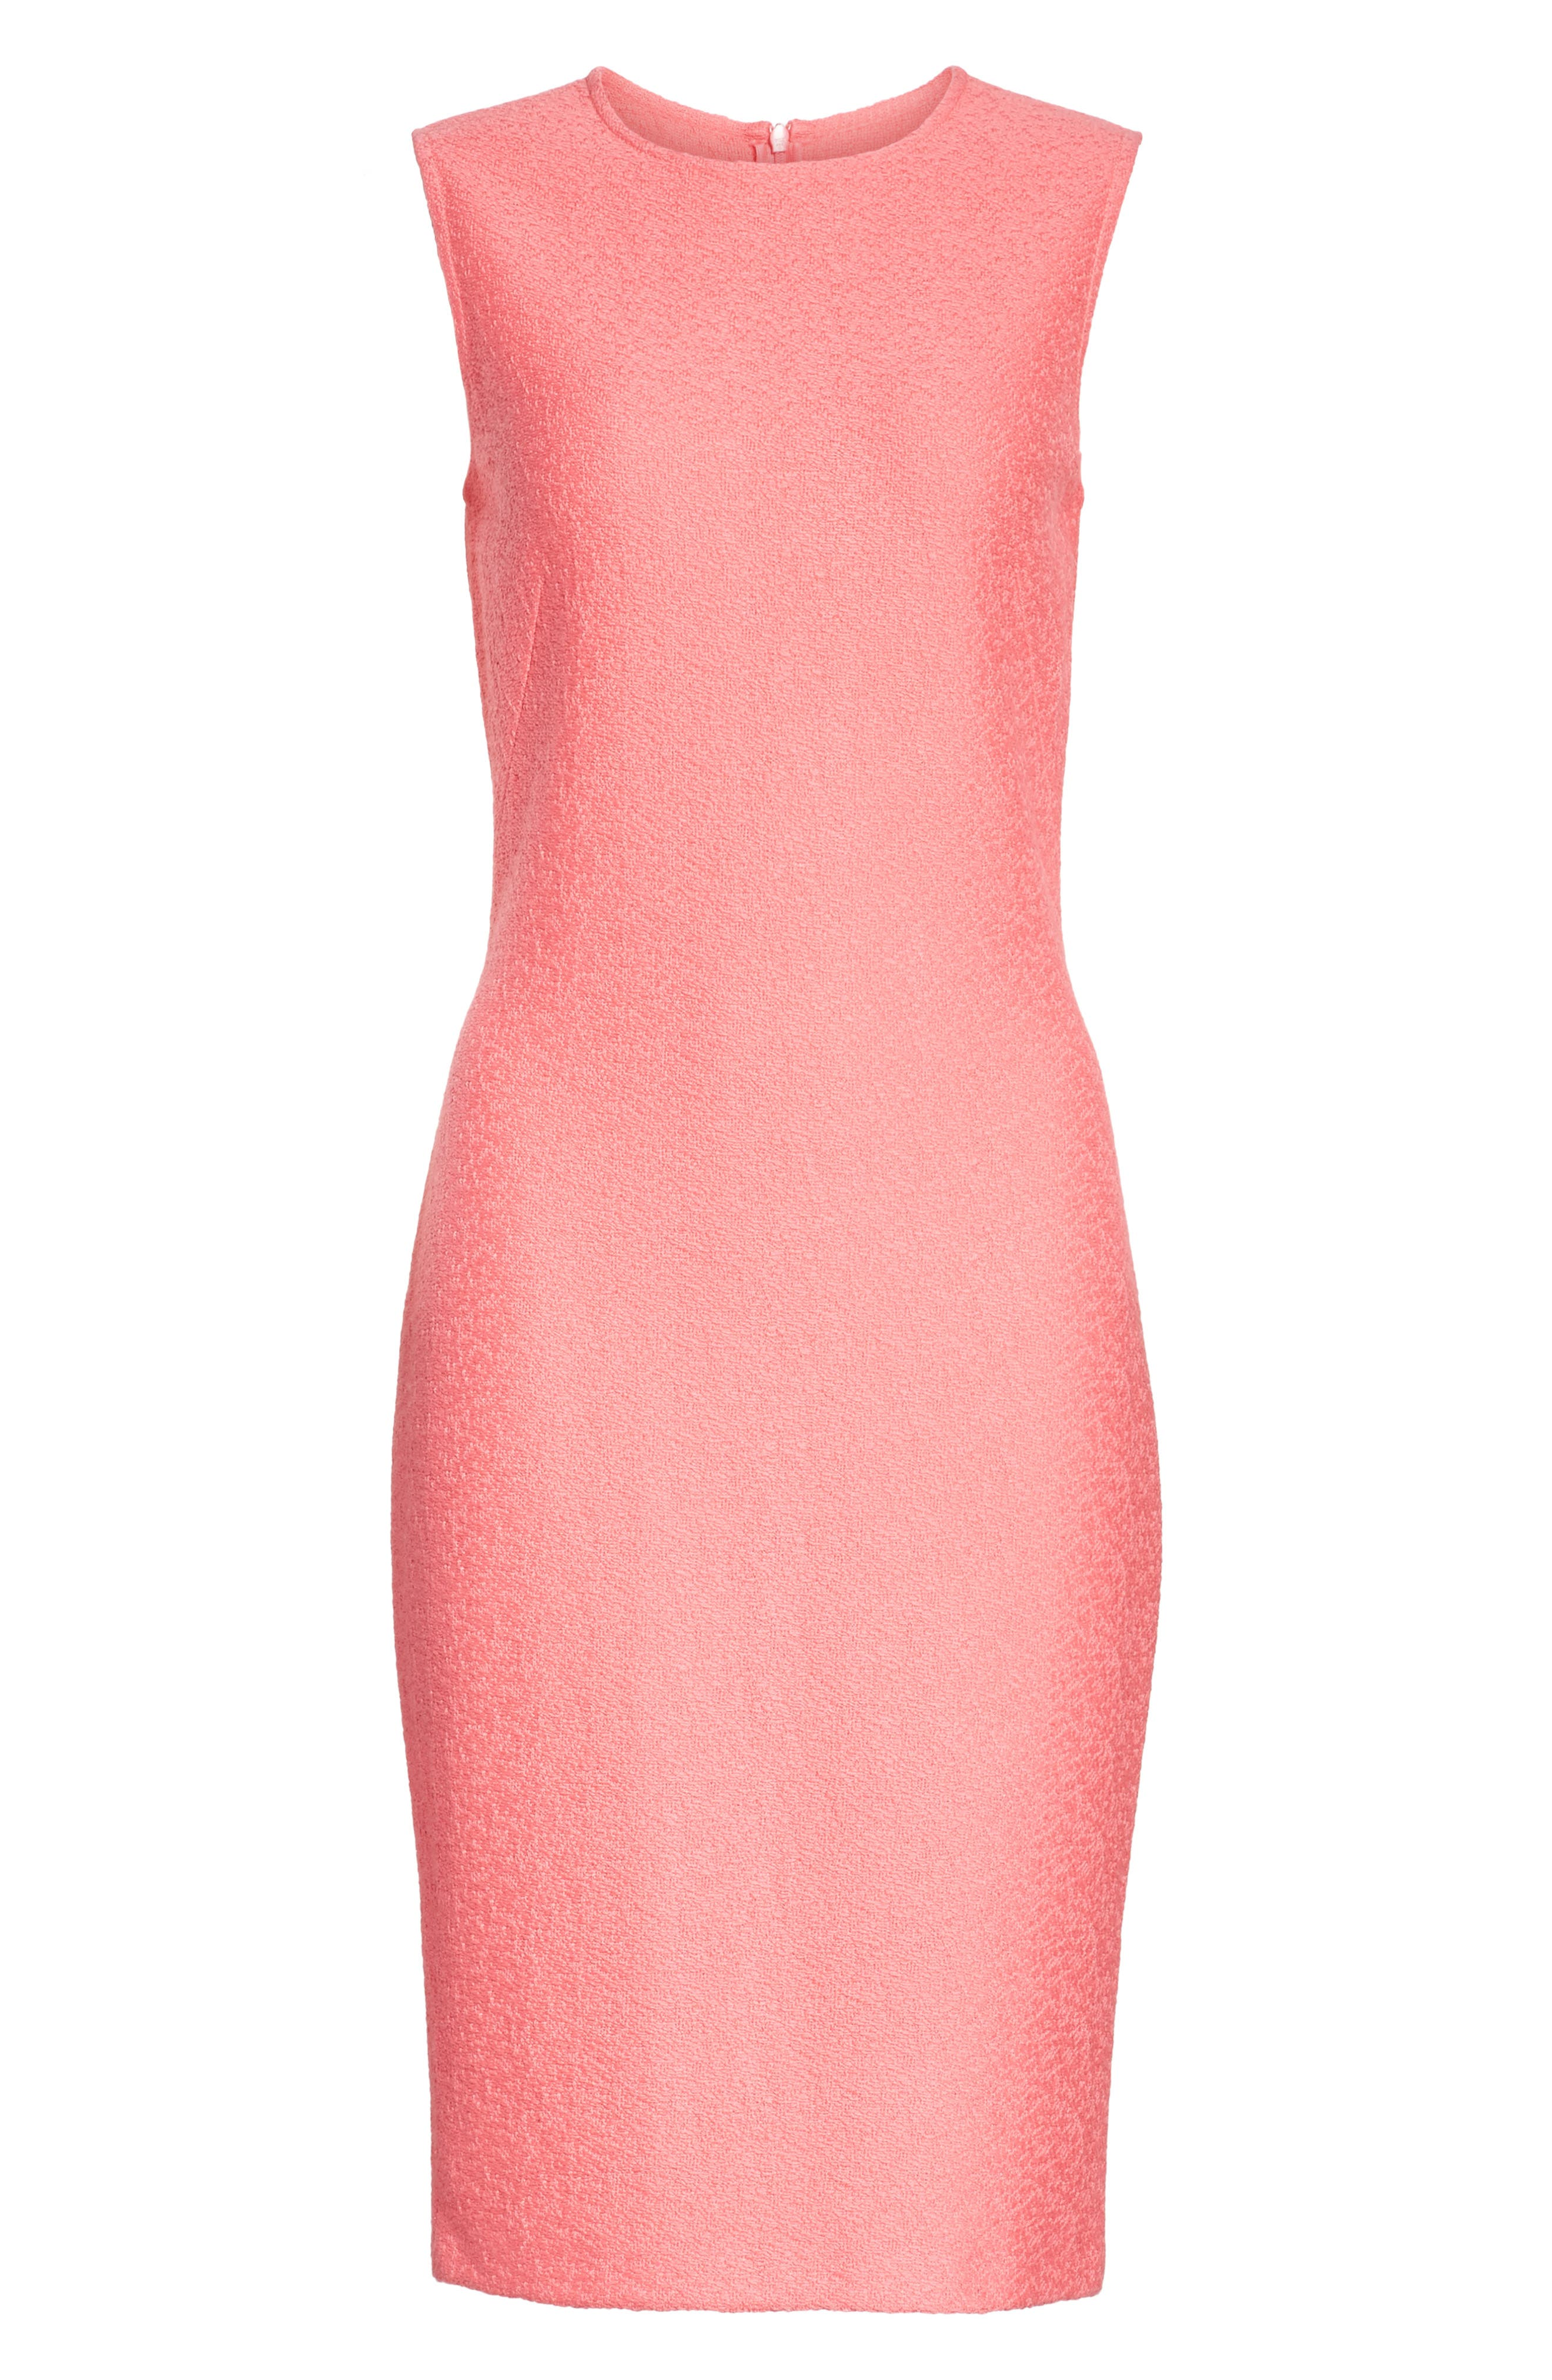 Hannah Knit Sheath Dress,                             Alternate thumbnail 8, color,                             Bright Coral